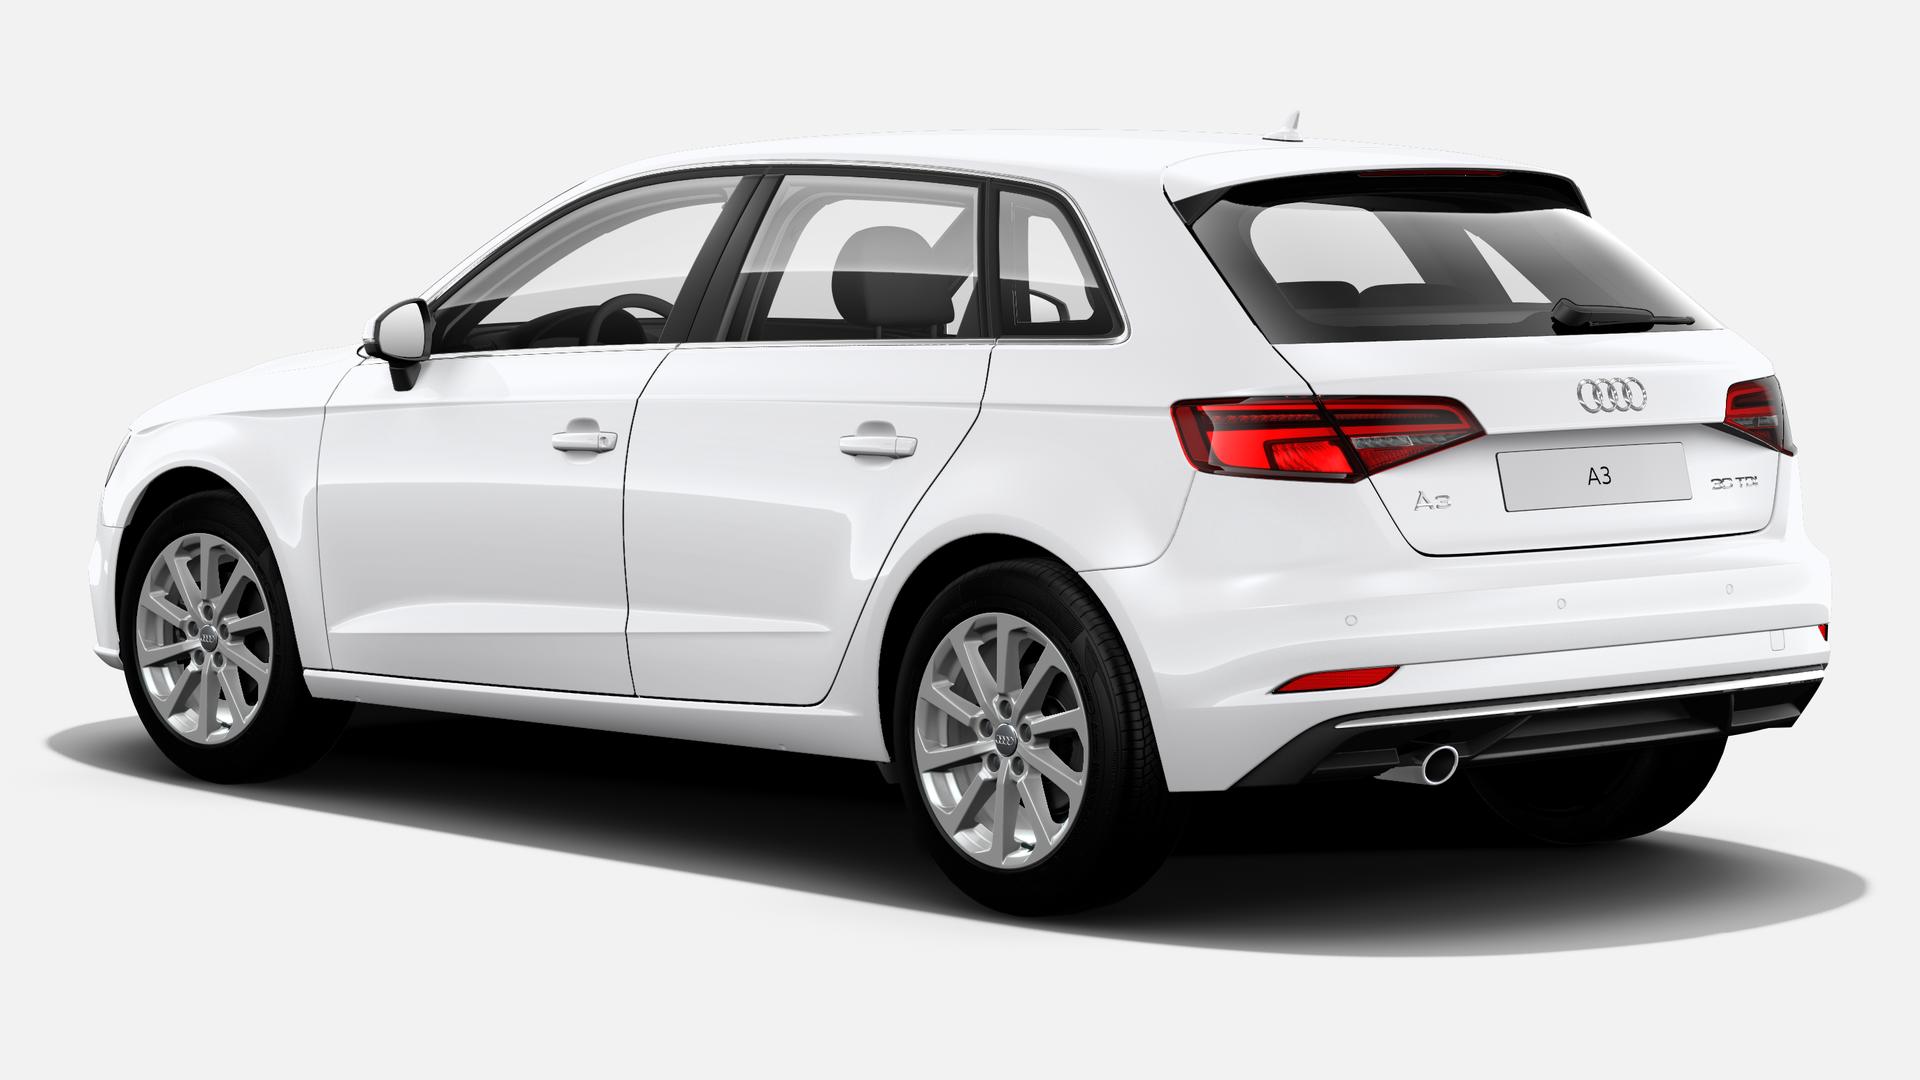 Vista Tres cuartos trasera izquierda de Audi A3 Sportback 1.6 TDI Design Edition S-tronic 85 kW (116 CV)